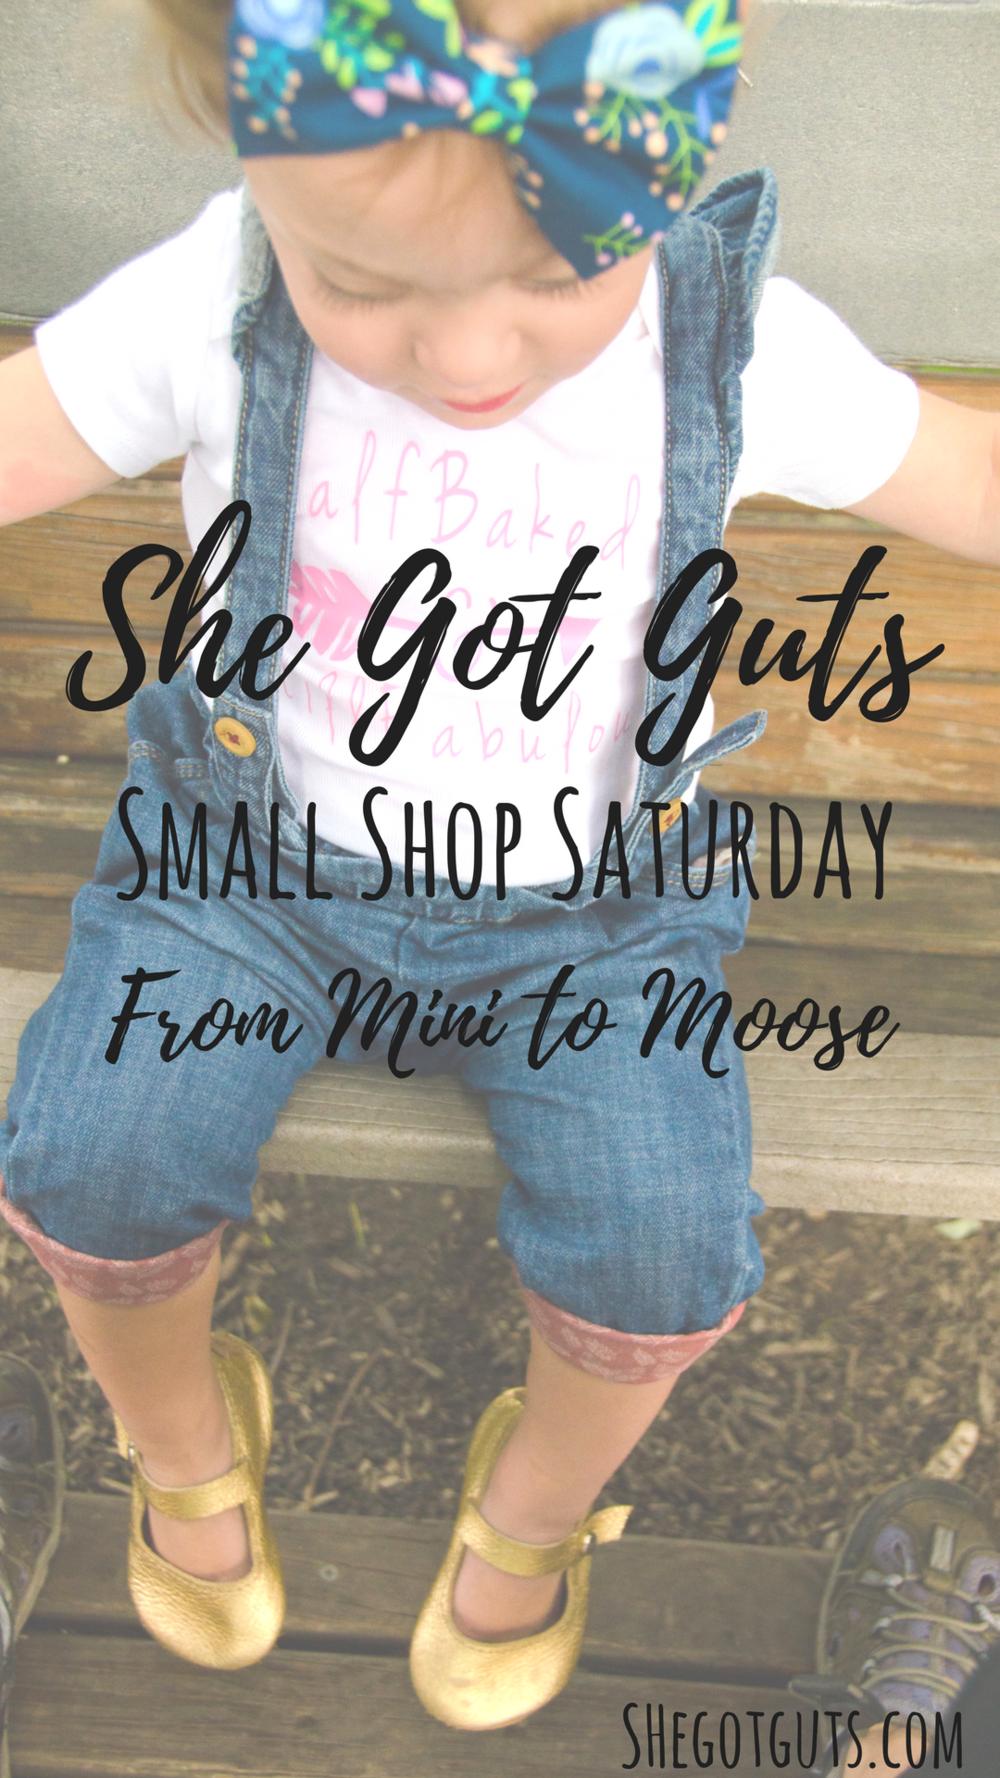 Small Shop Saturday - Mini to Moose - shegotguts.com